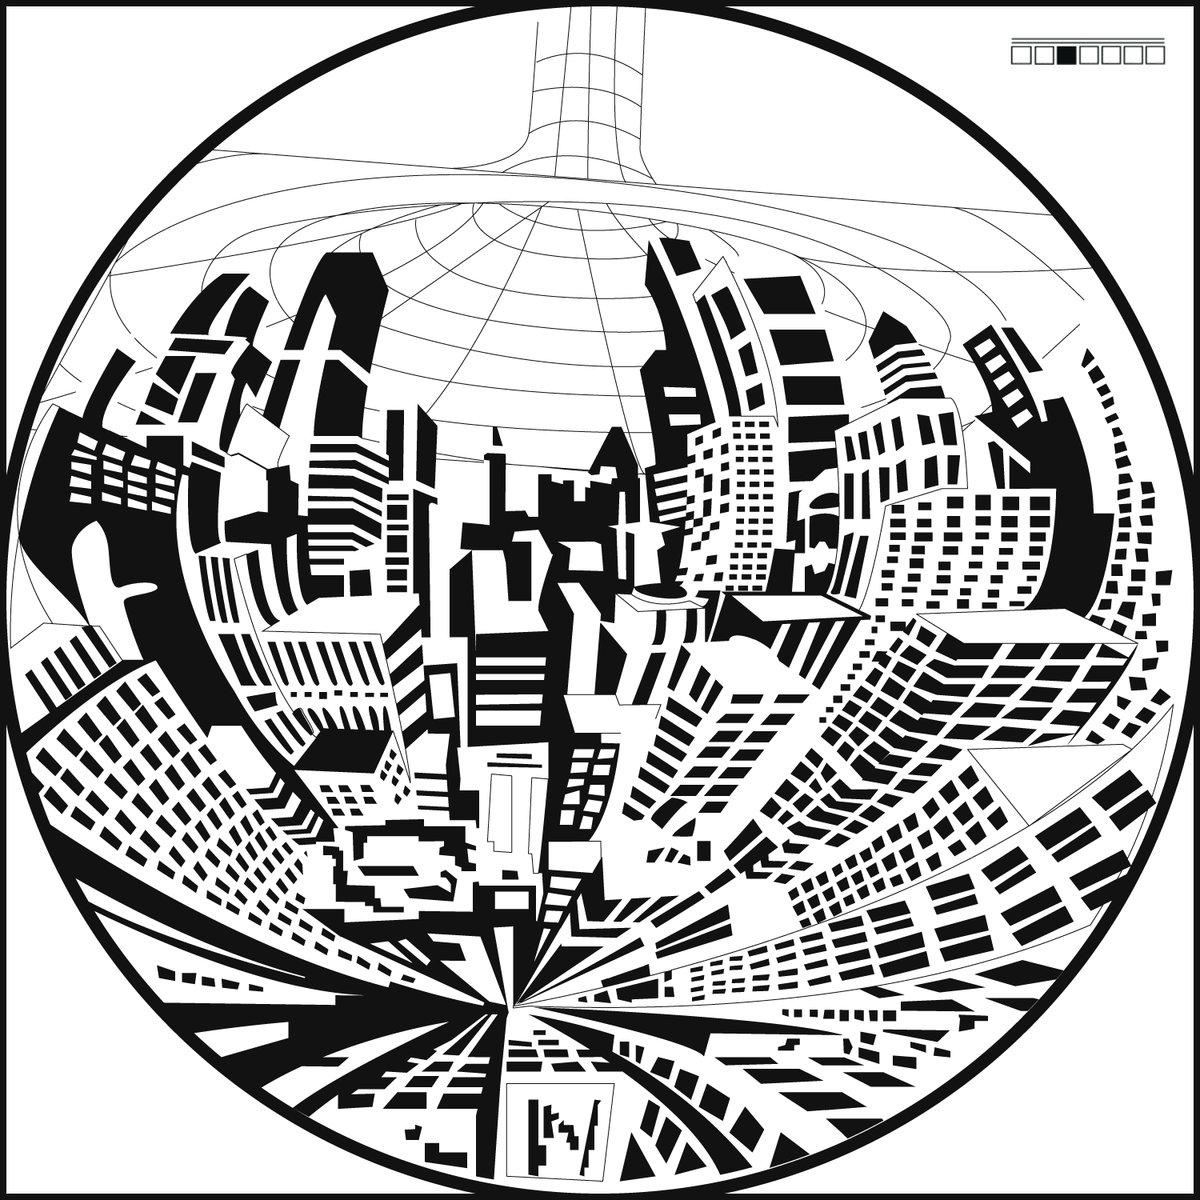 RBCHMBRS - Estrella EP (1432R)